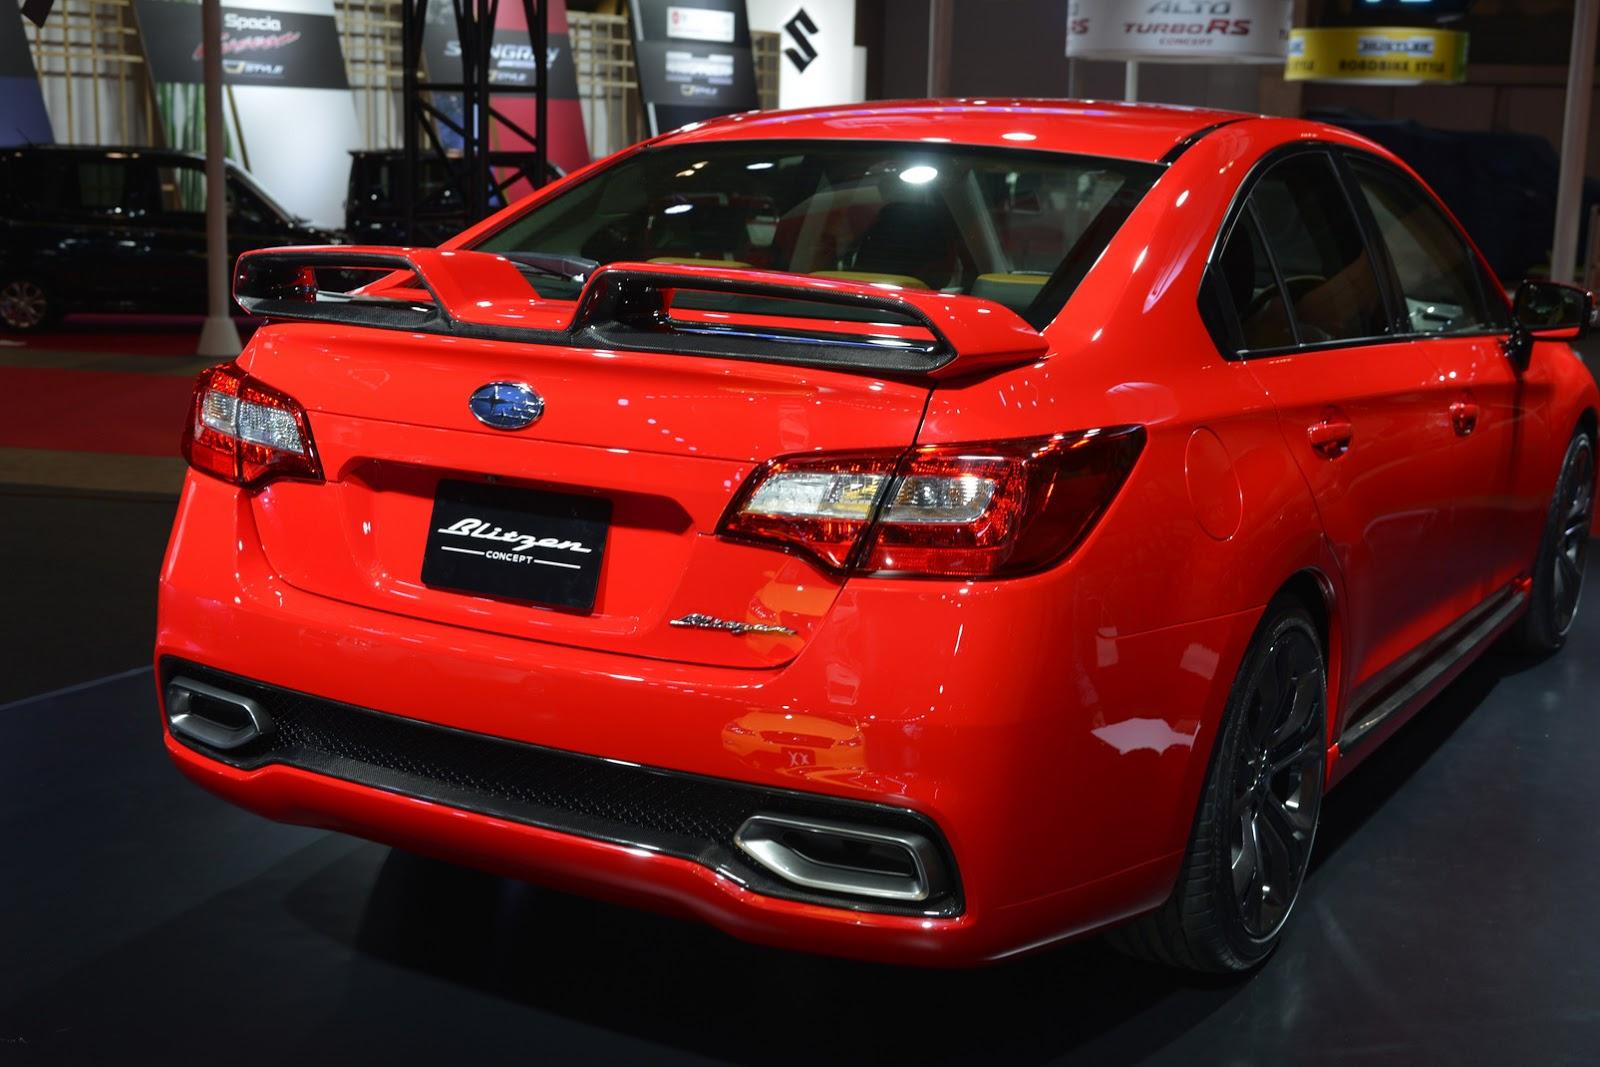 2018 subaru legacy gt. Interesting 2018 Wrx Hatchback Wing  Subaru Warms Up Legacy B4 Blitzen Concept For  Tokyo Auto Salon  Intended 2018 Subaru Legacy Gt